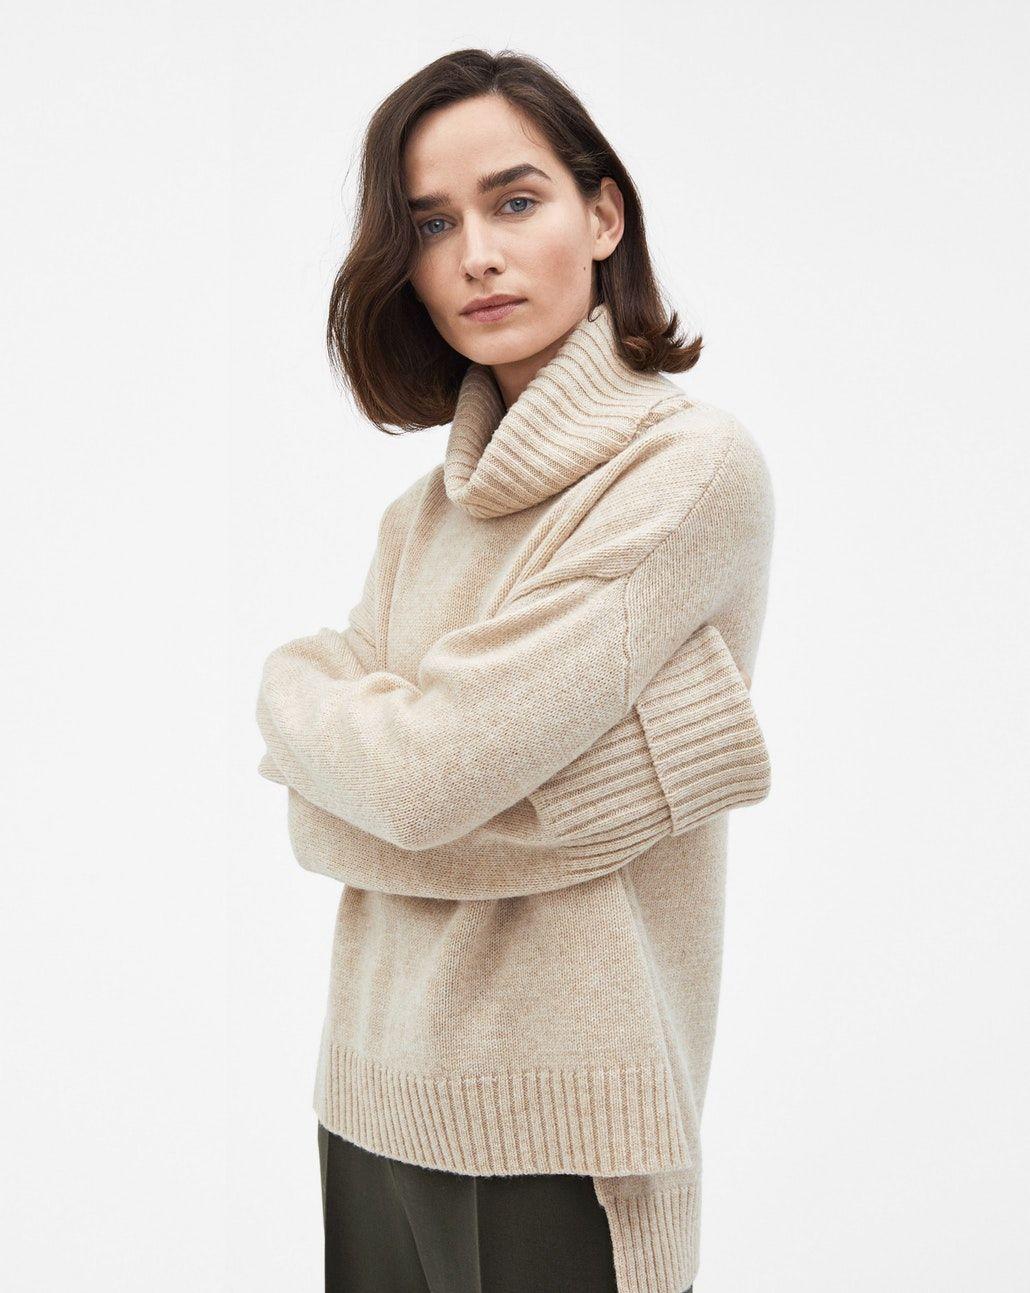 Pin by susanna on fall | Pinterest | Sweaters, Filippa k and